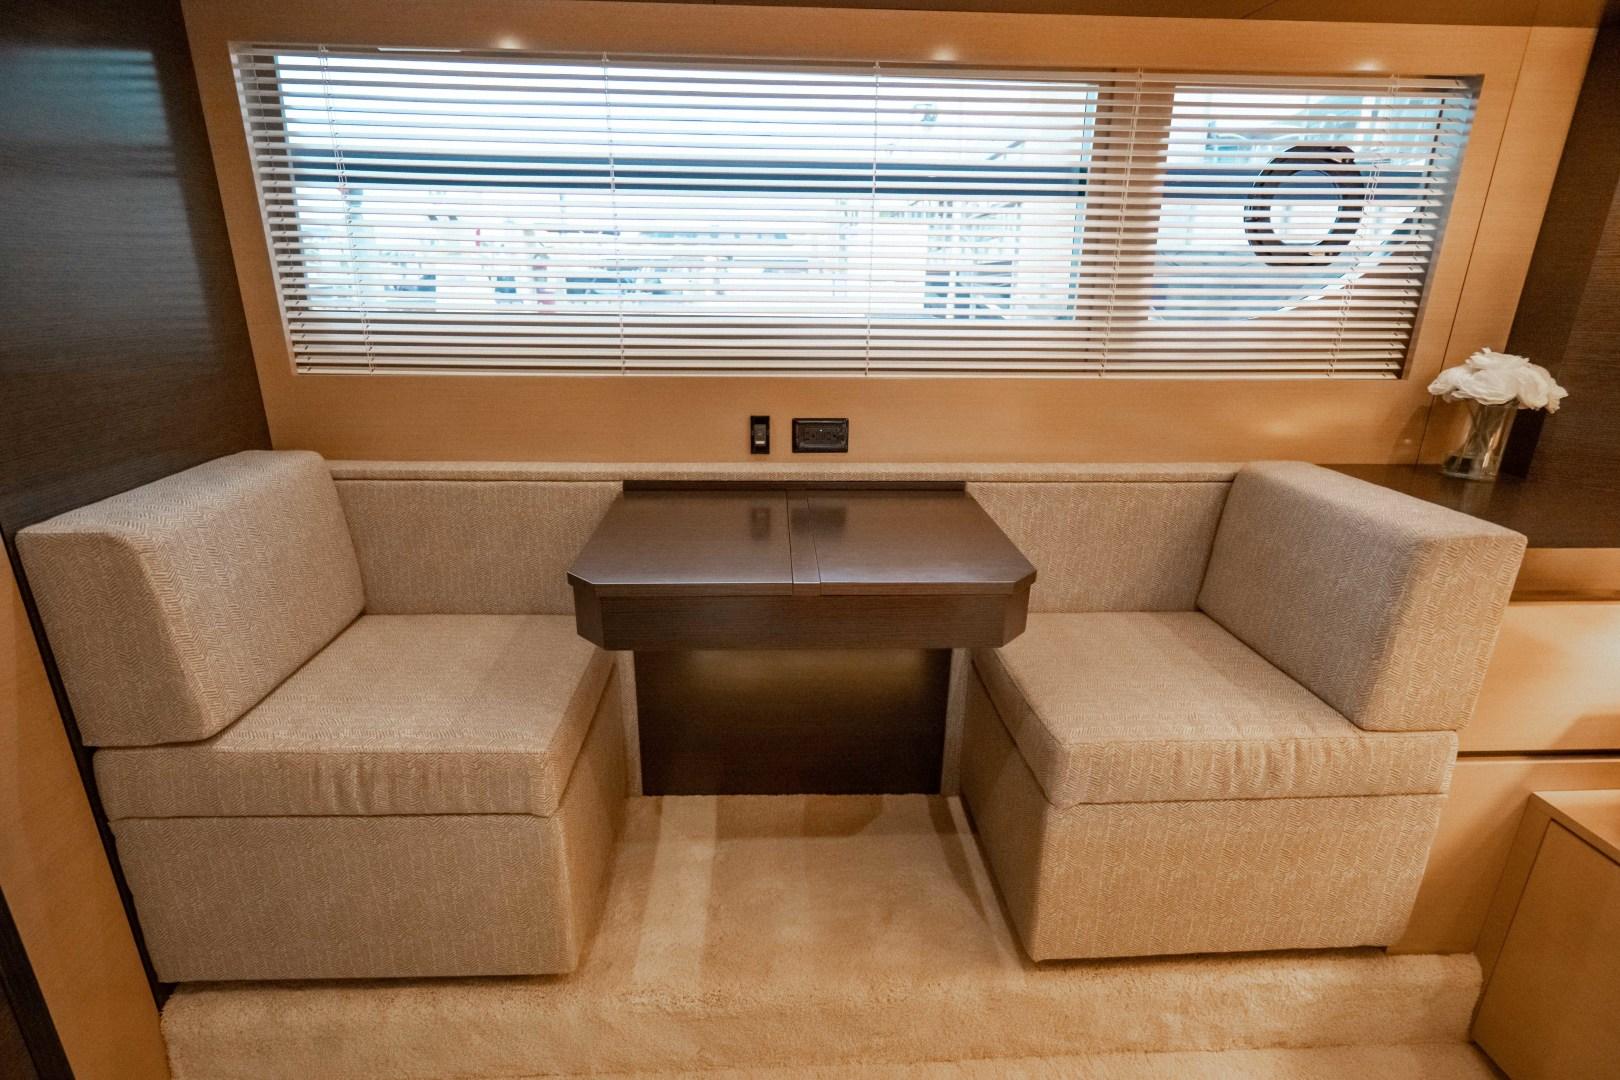 Cruisers-60 Cantius 2018-Sea Rhythm III Anna Maria-Florida-United States-2018 Cruisers 60 Cantius FB  Sea Rhythm III  Master Stateroom Seating-1583279 | Thumbnail